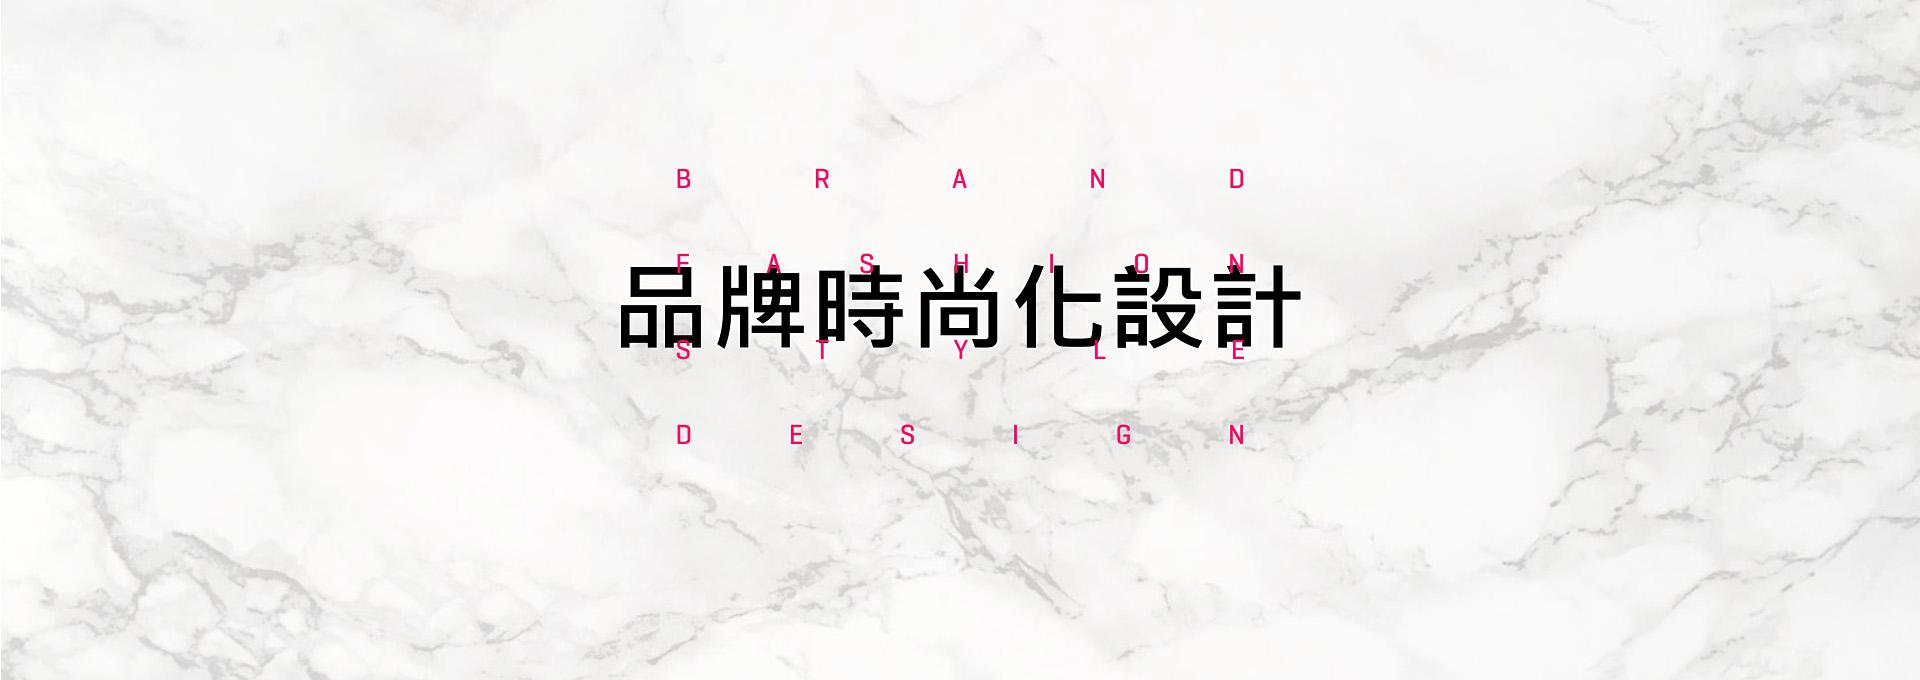 w88设计ad